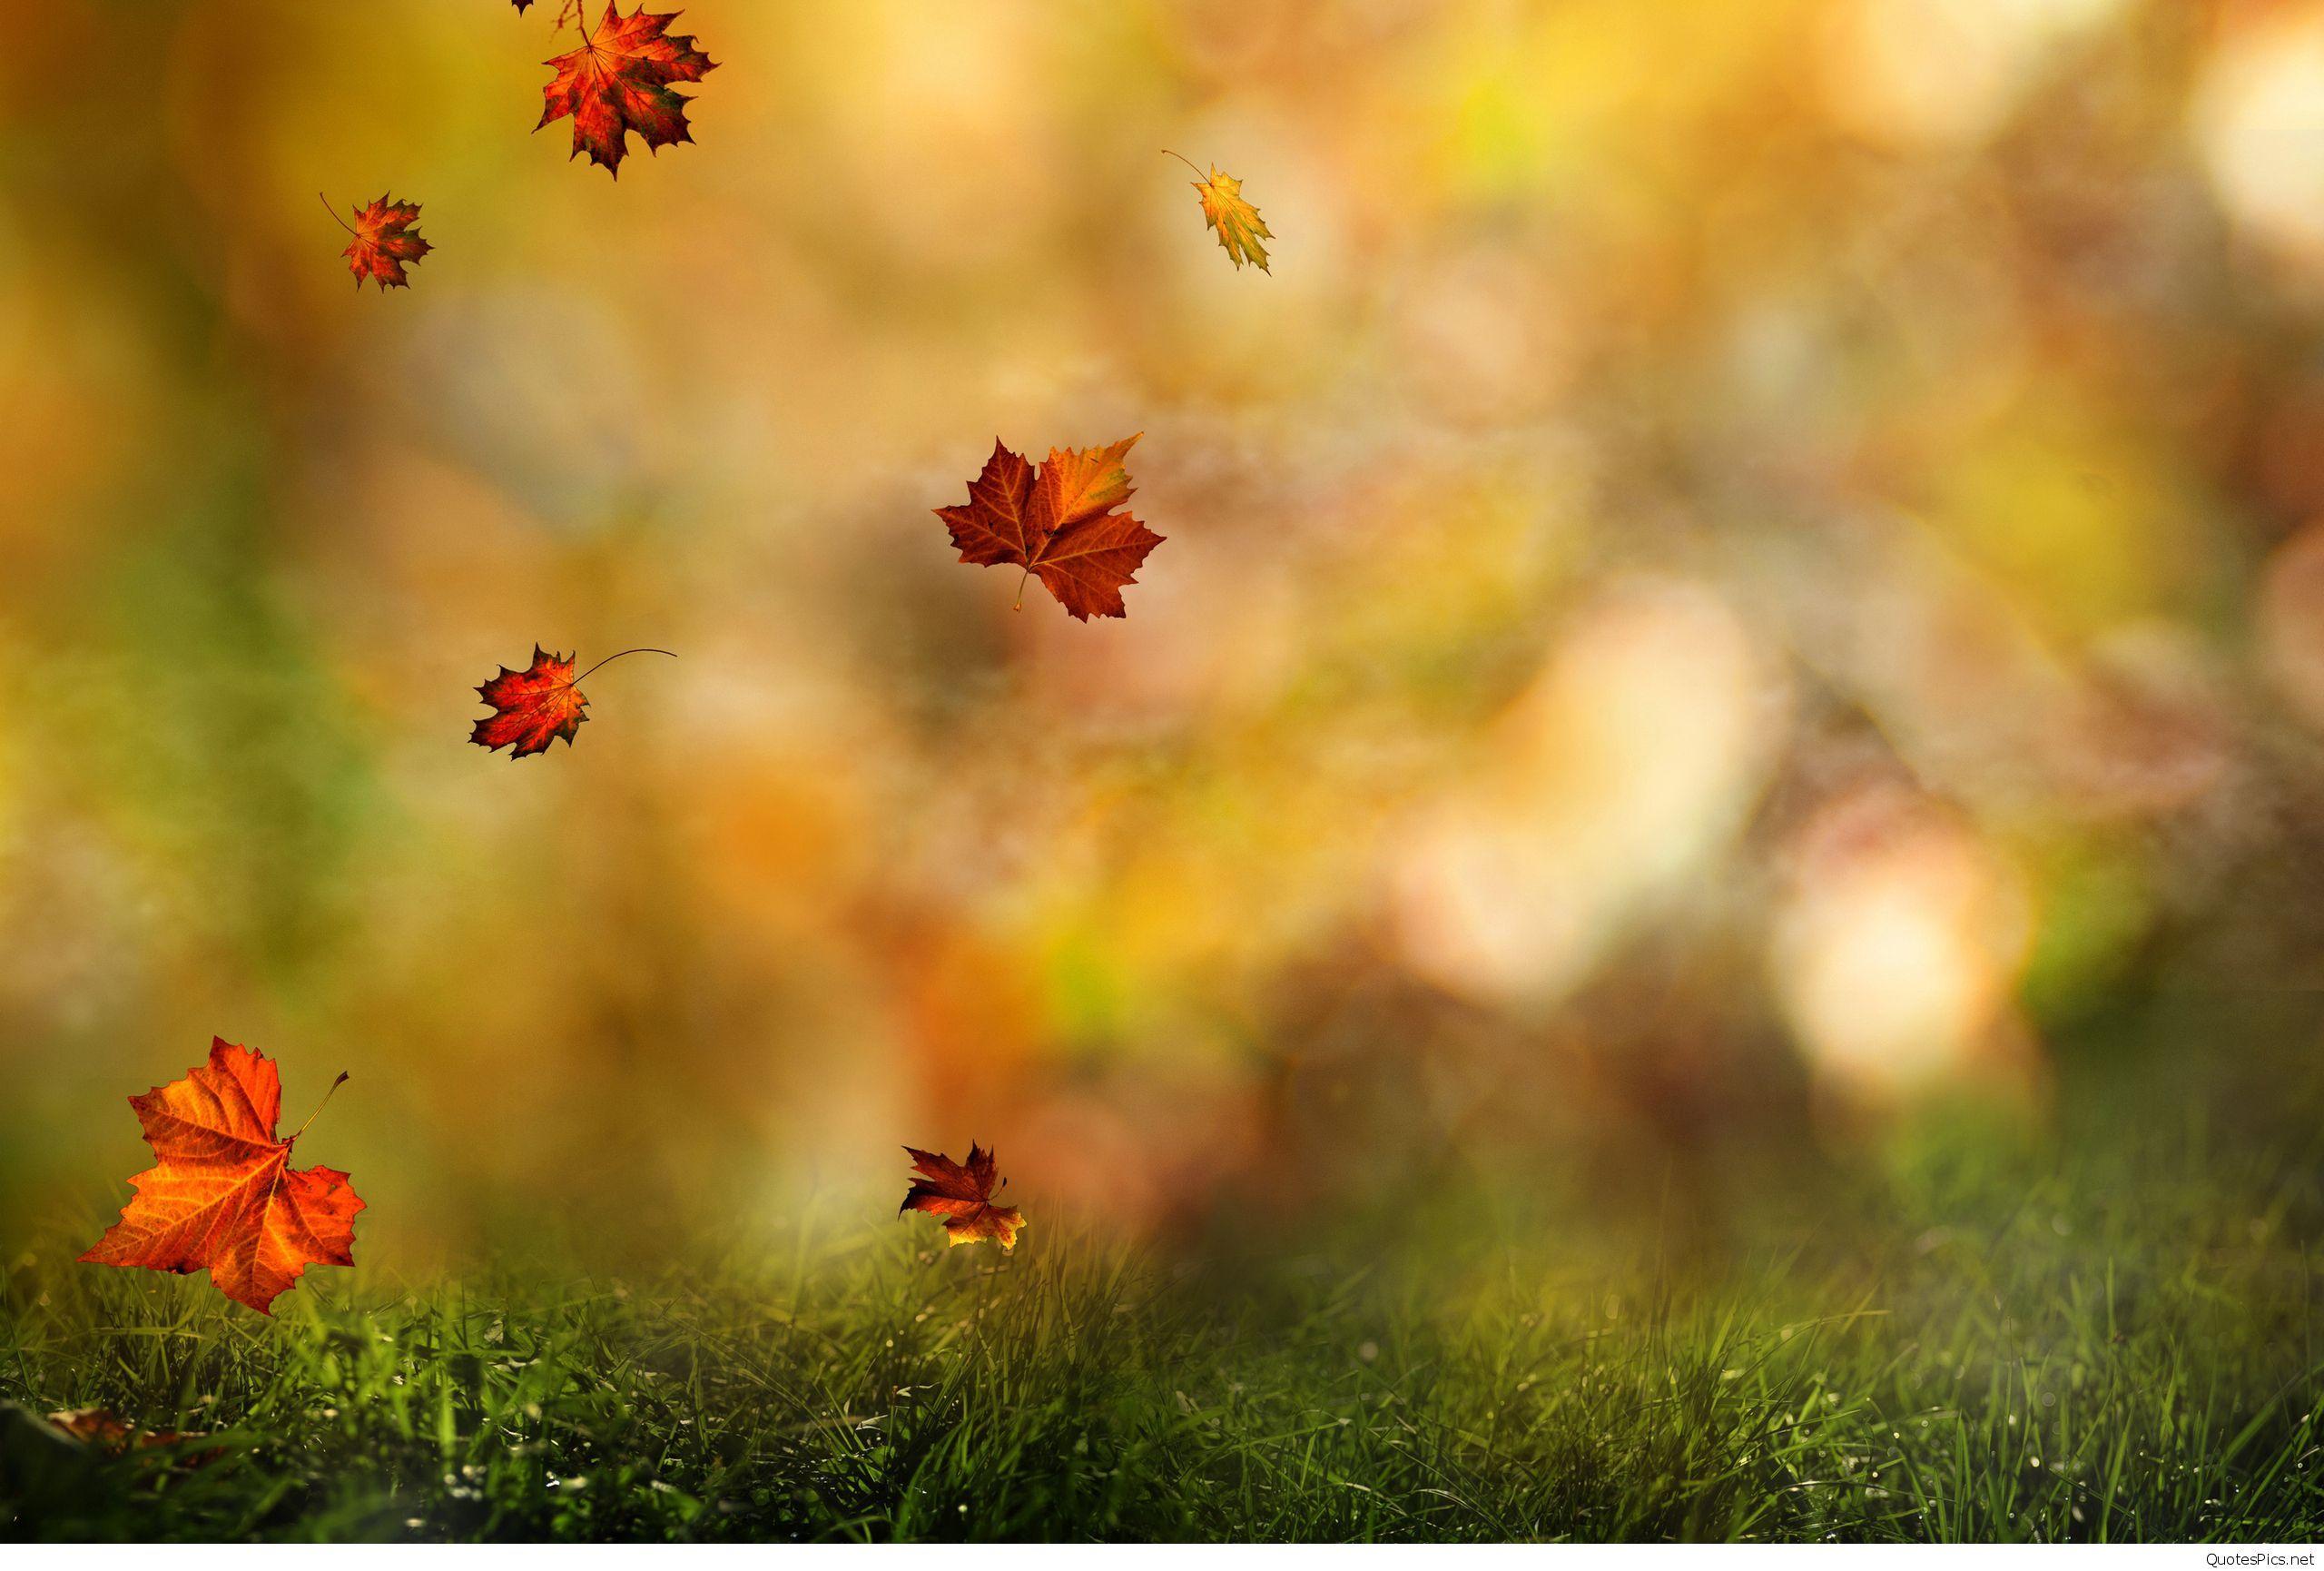 September Wallpapers   Top September Backgrounds 2560x1730